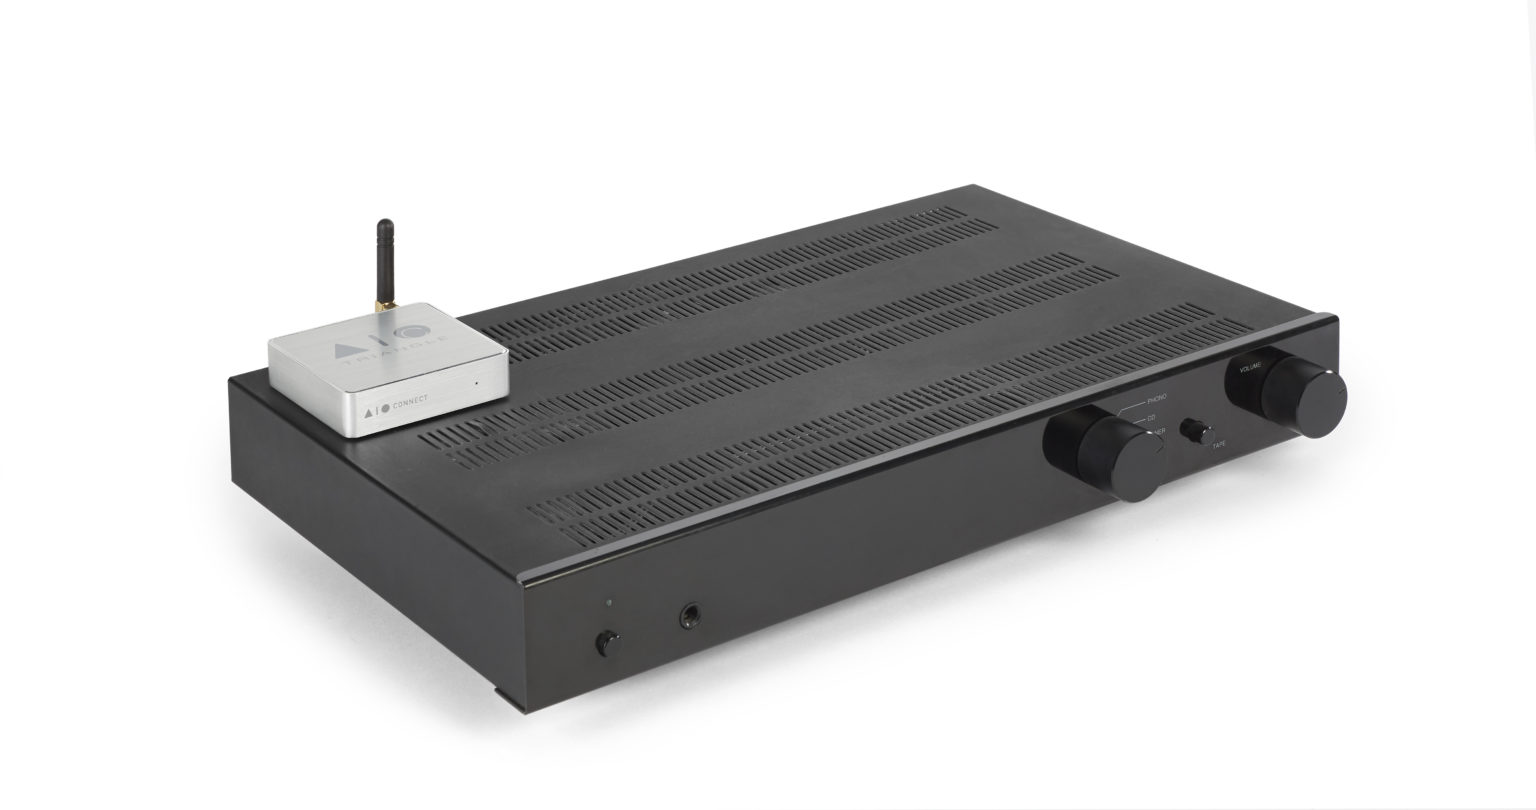 Système Enceinte connectée bluetooth wifi hifi triangle AIOC packshot 08